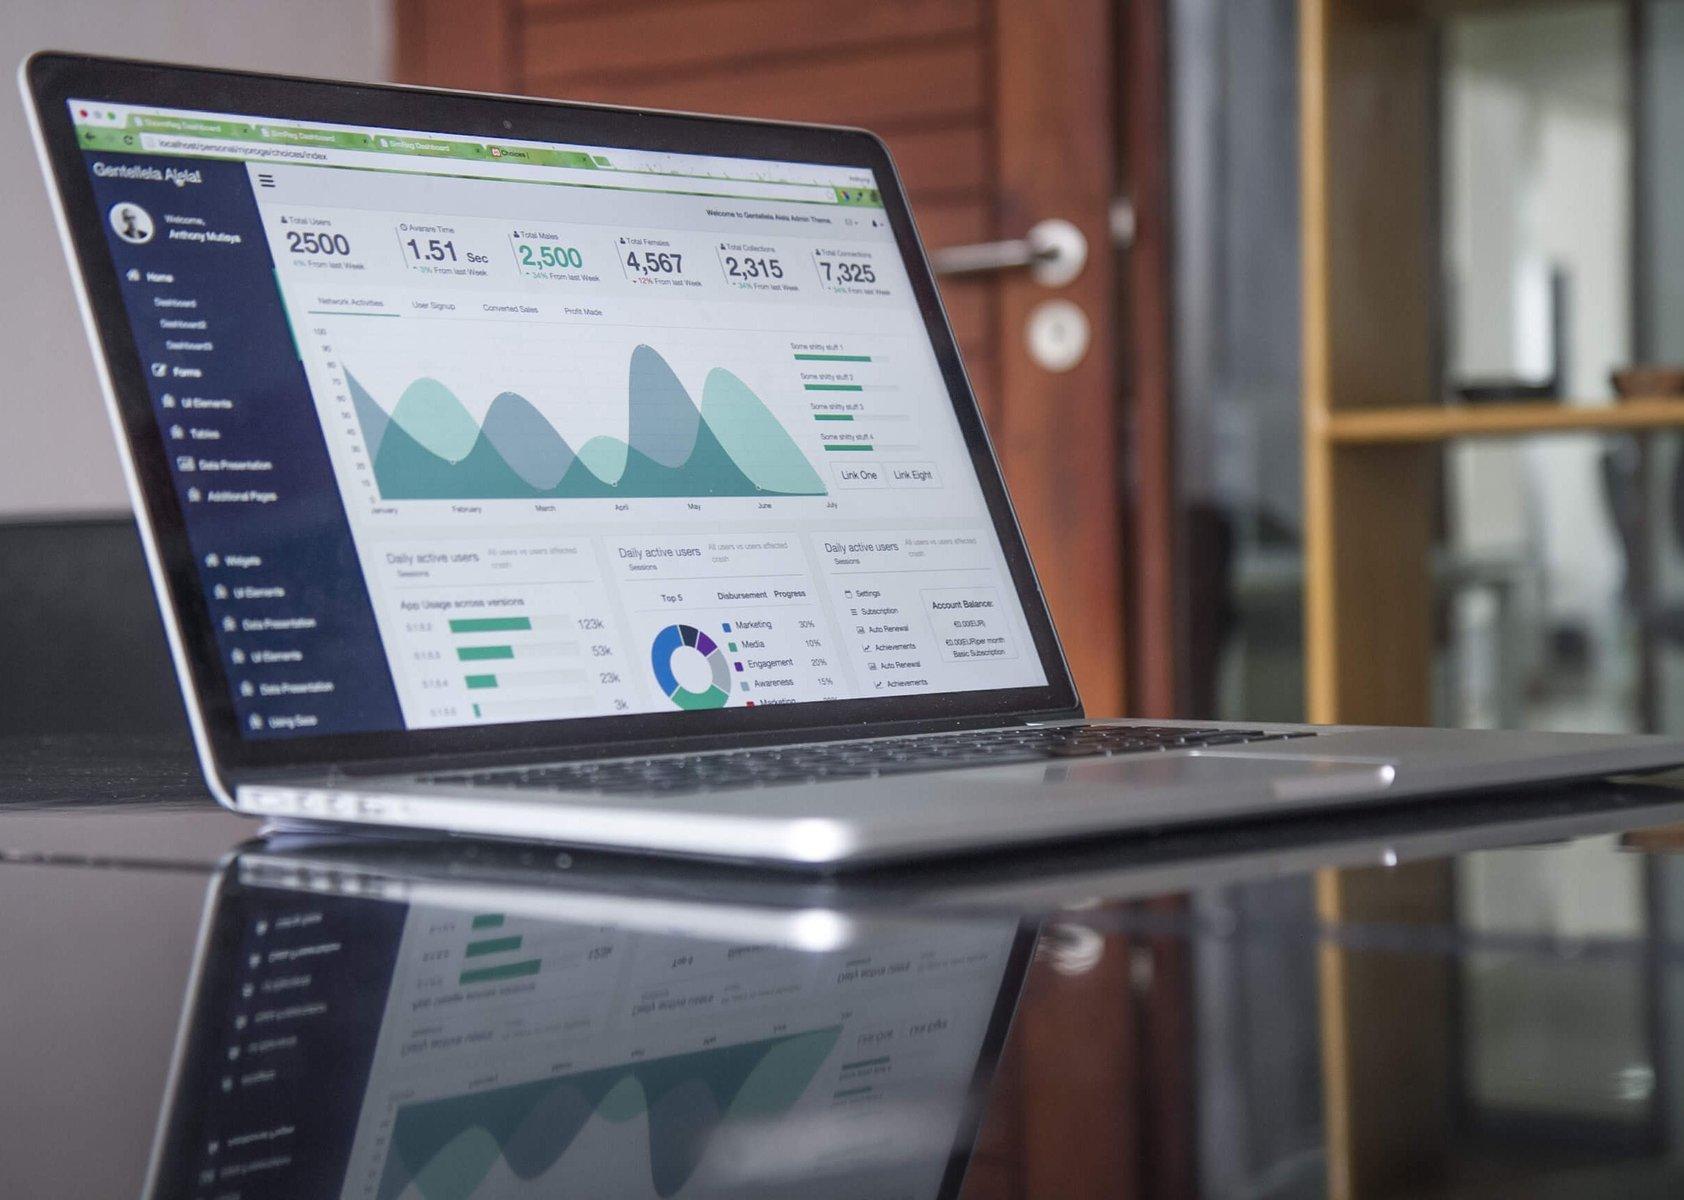 video performance analysis